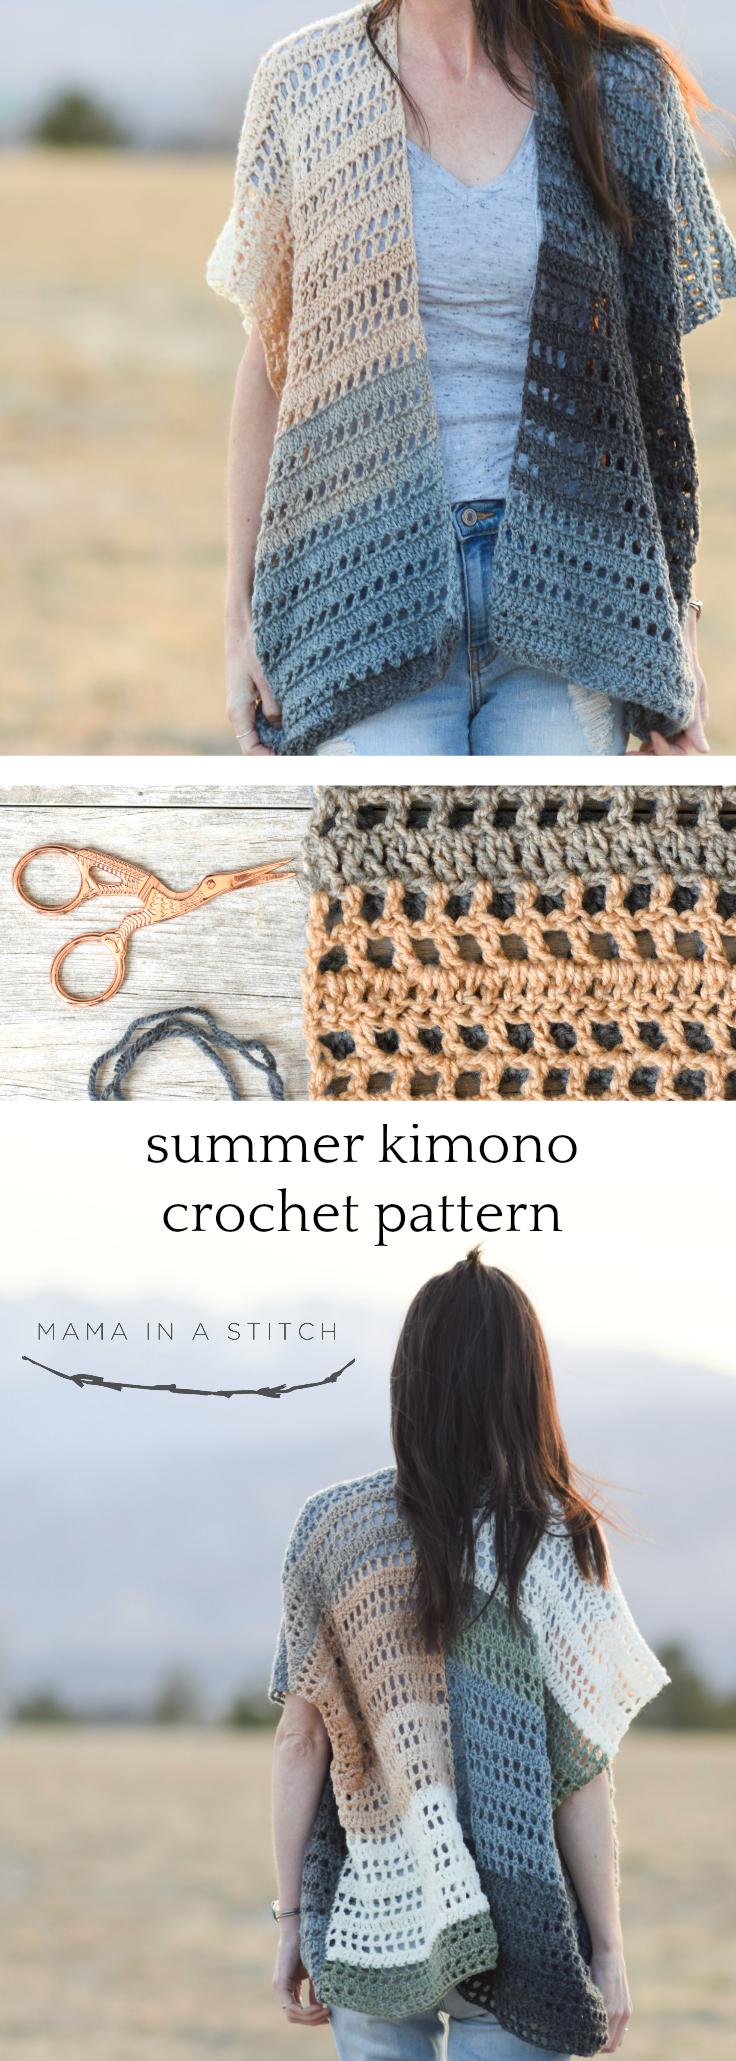 Barcelona Summer Crocheted Kimono Cardigan Pattern Mama In A Stitch